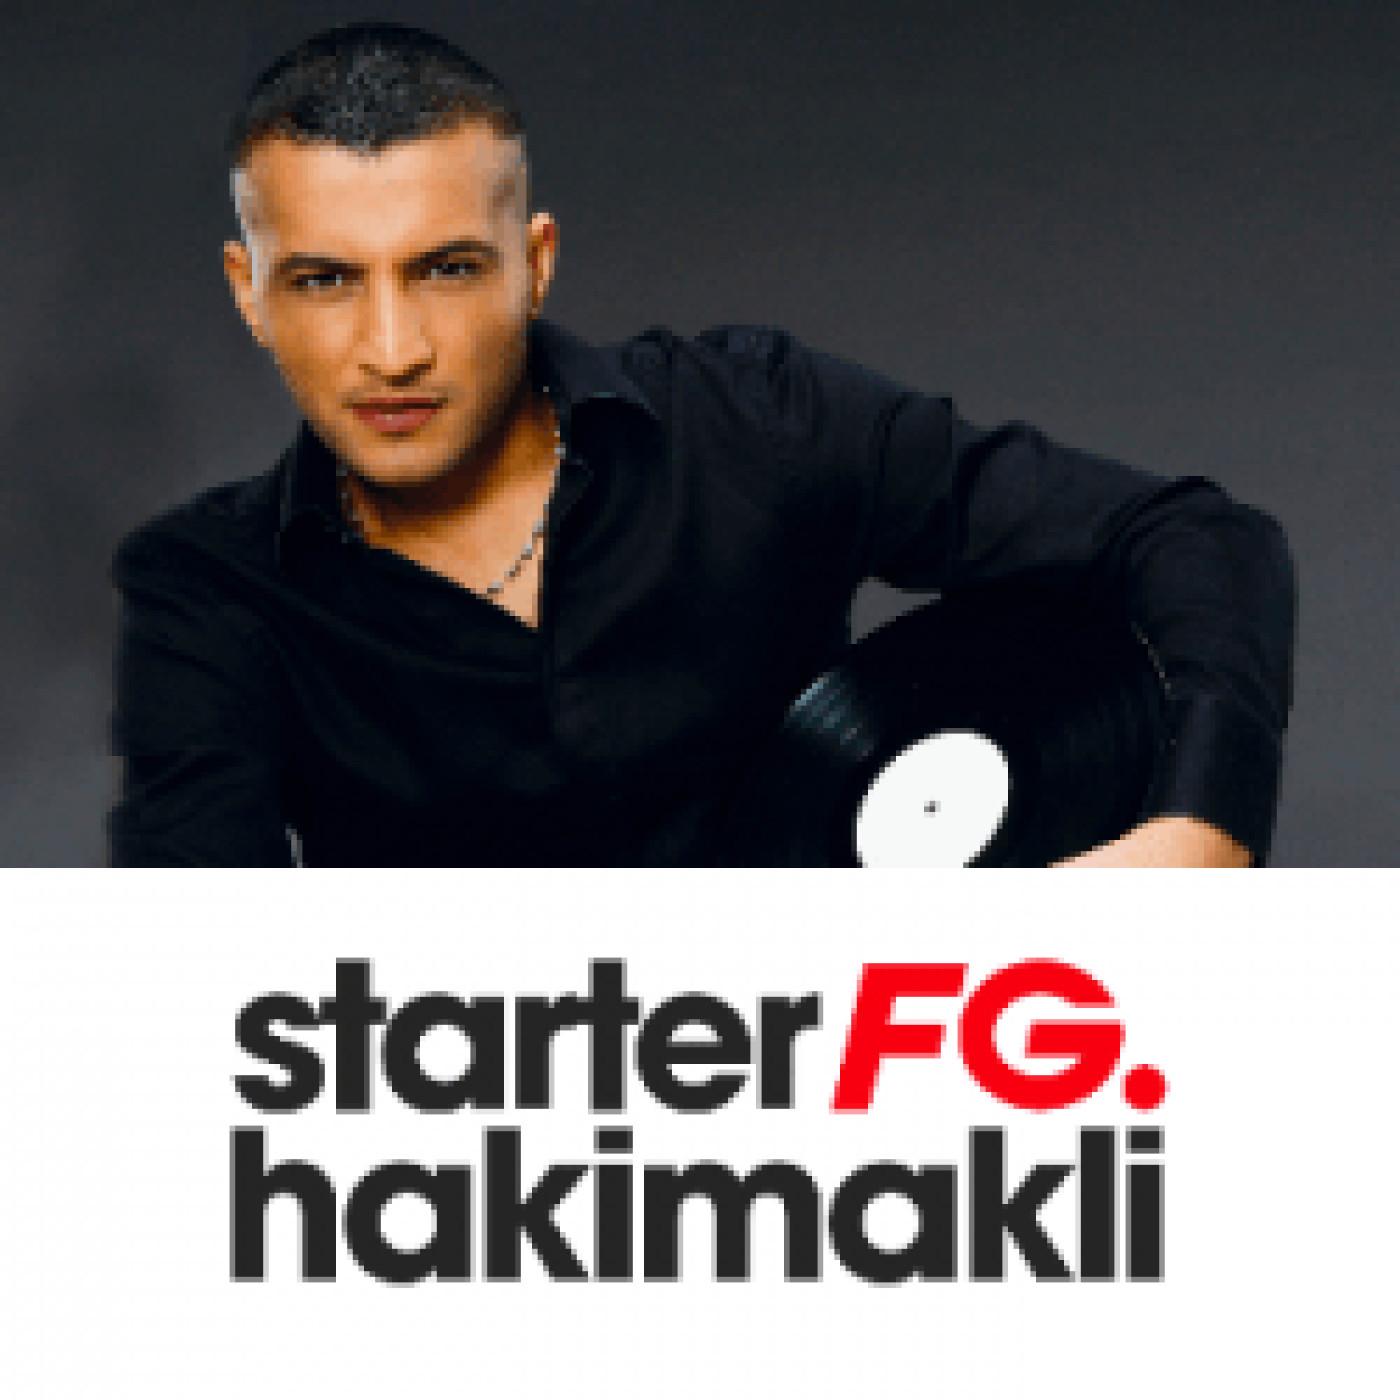 STARTER FG BY HAKIMAKLI MARDI 29 SEPTEMBRE 2020